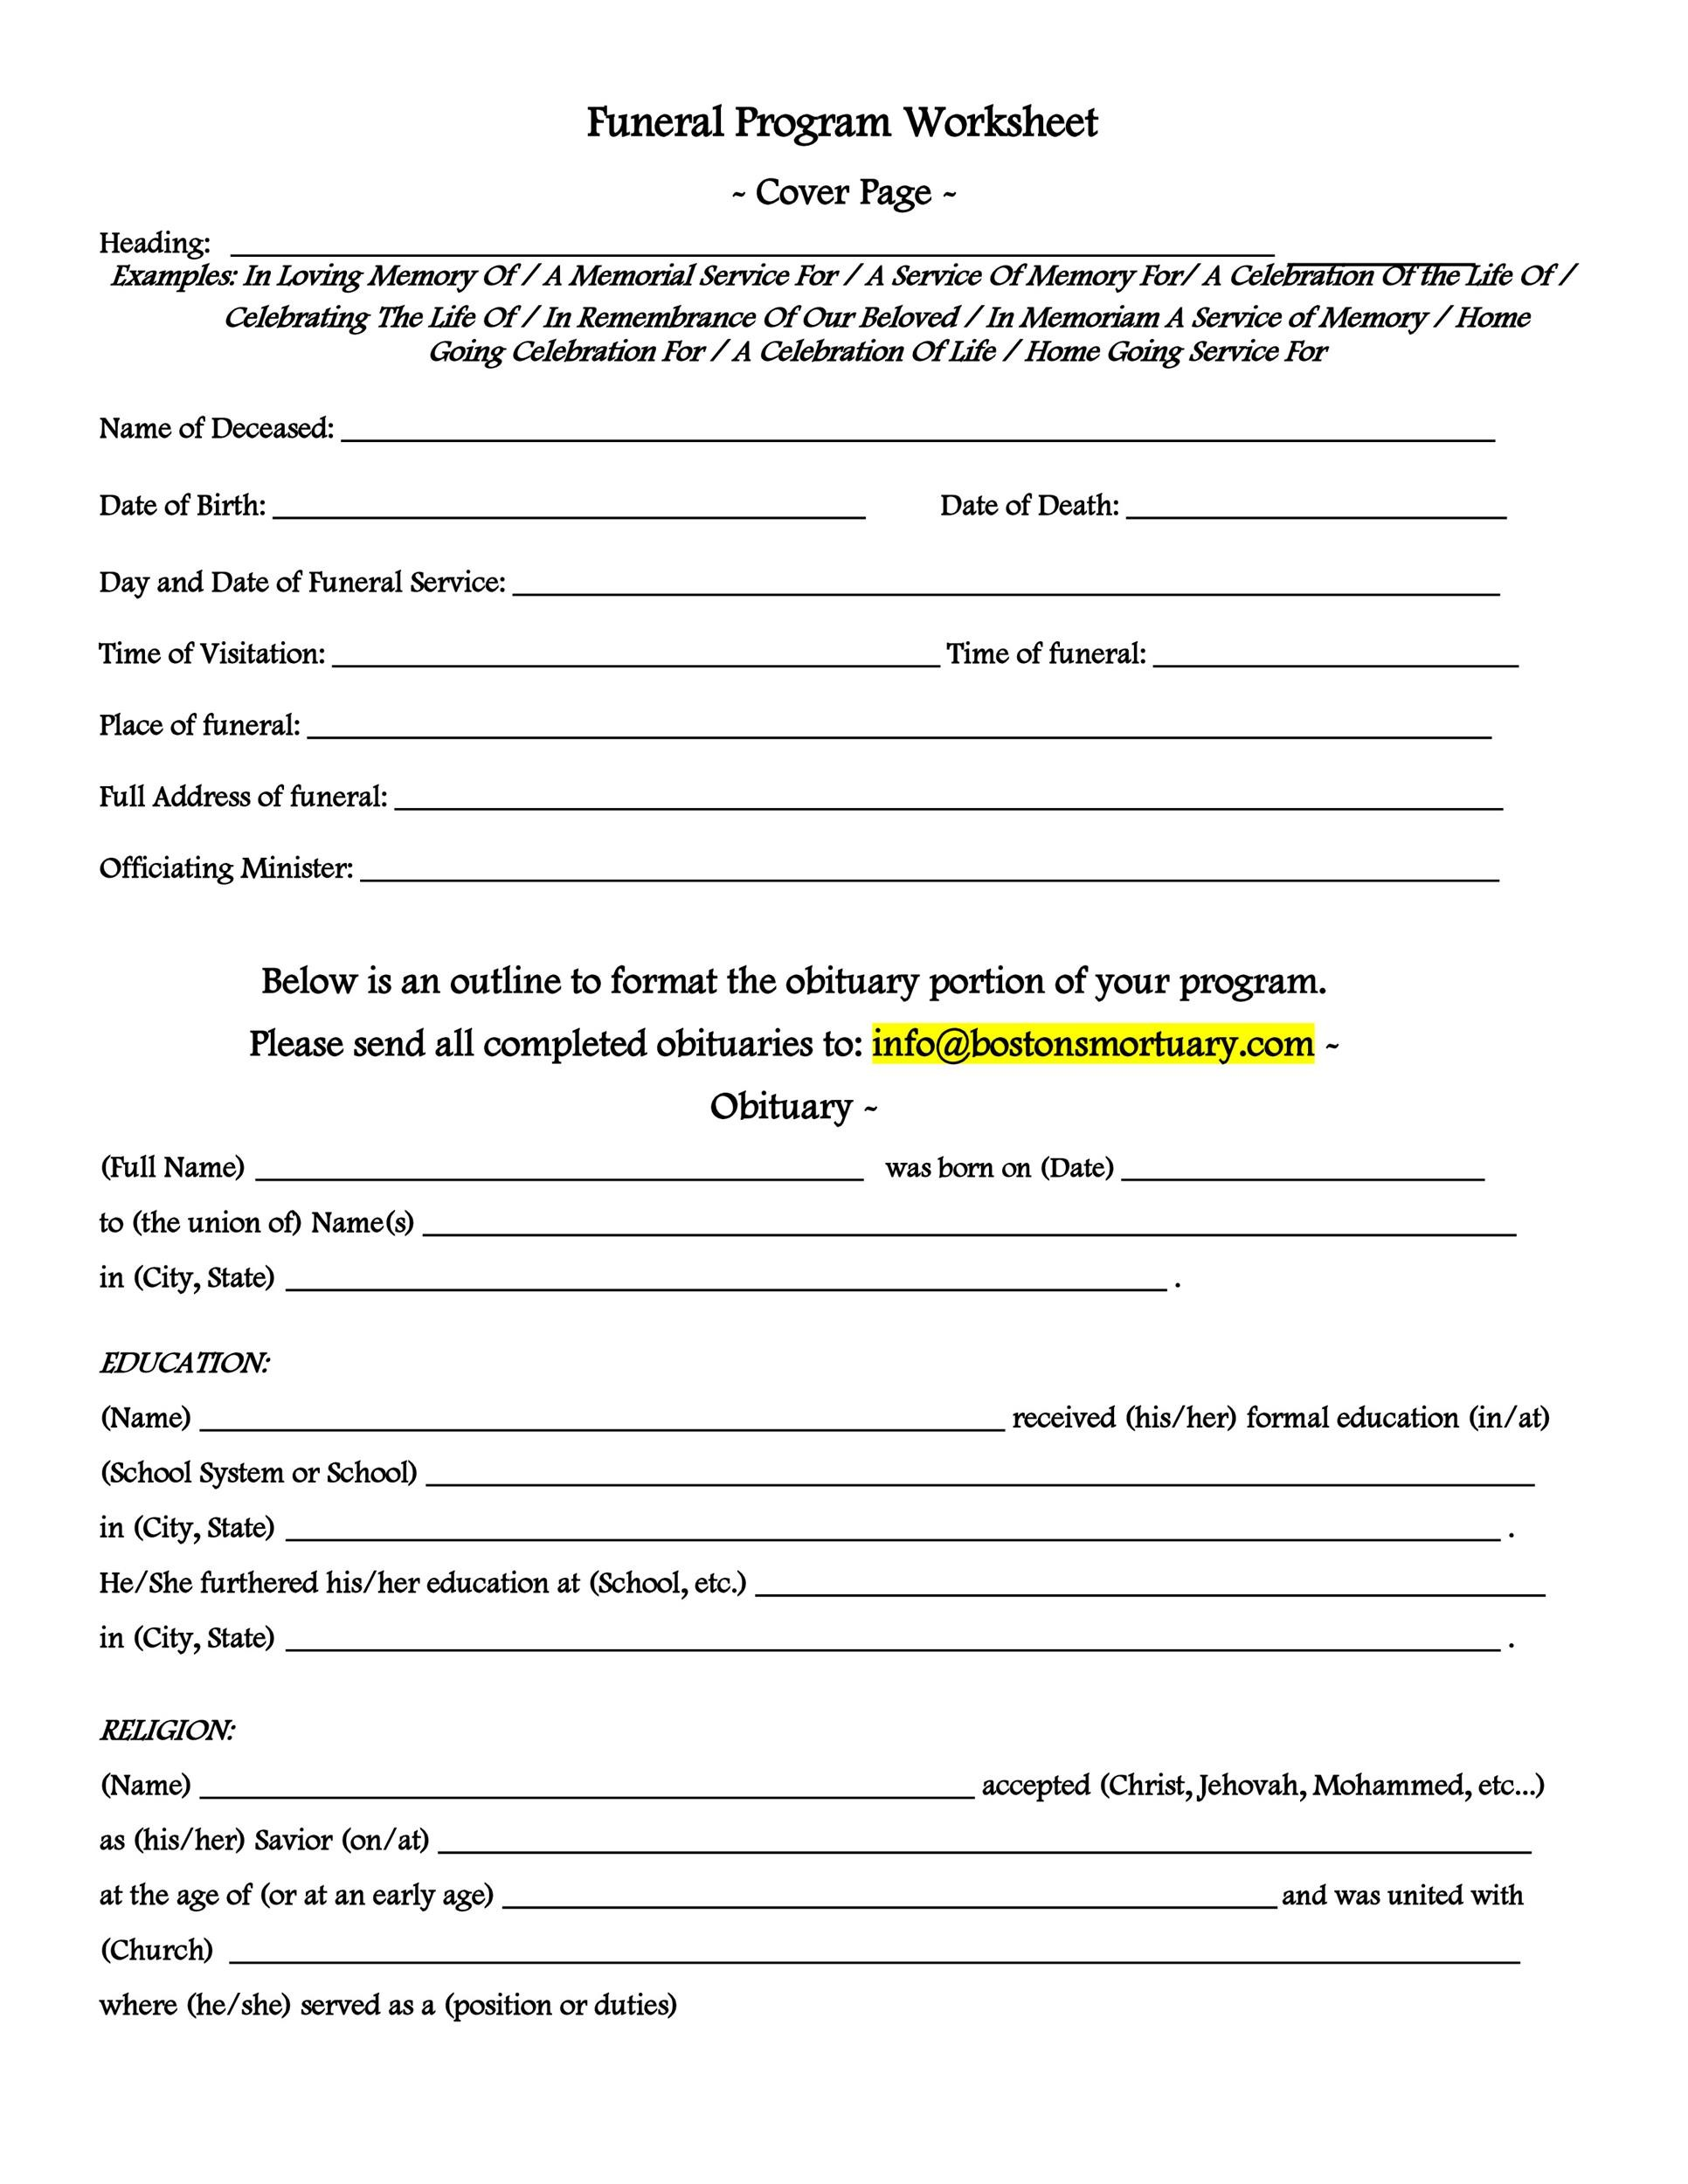 Free funeral program template 17